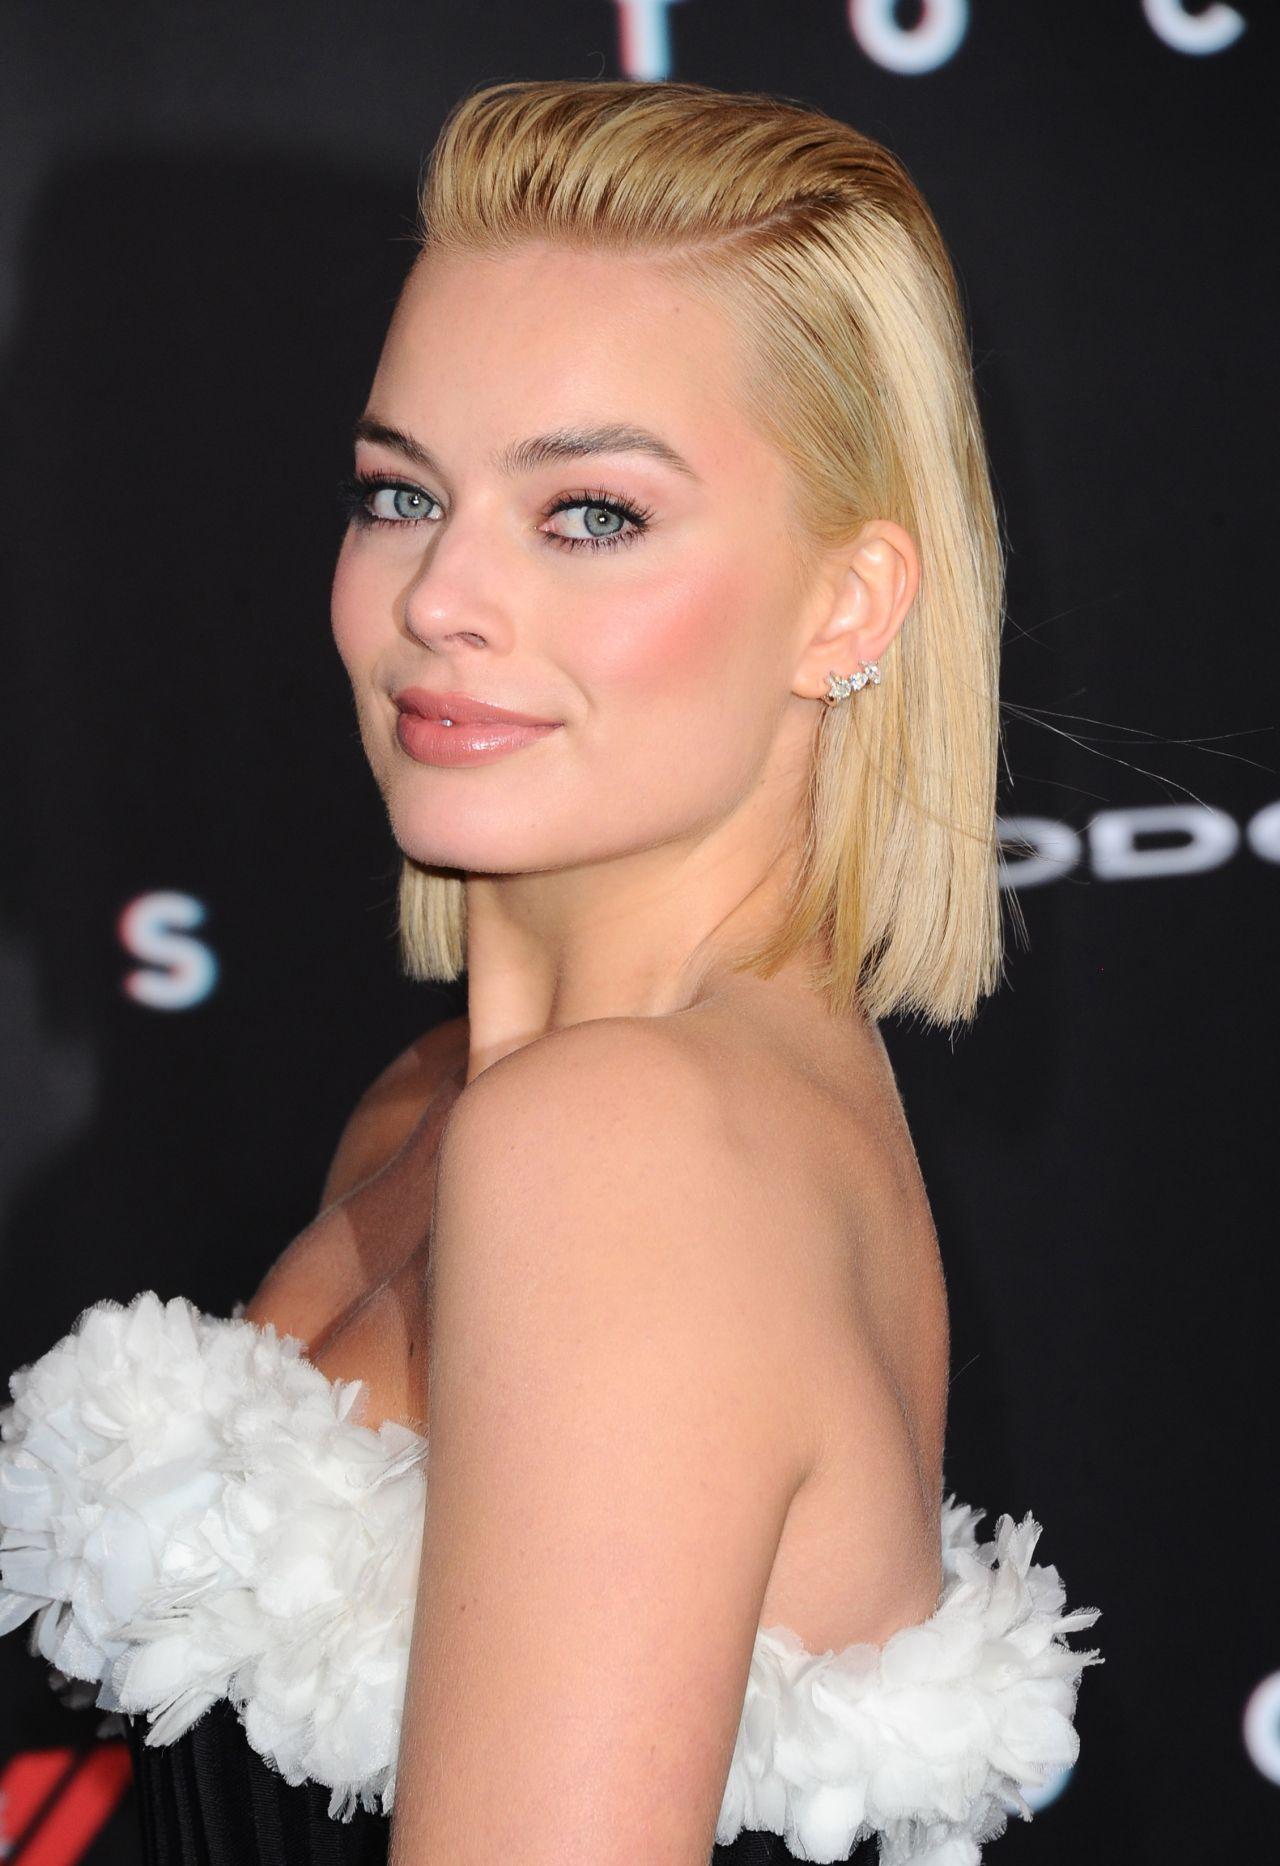 Margot Robbie Focus Movie Premiere In Los Angeles